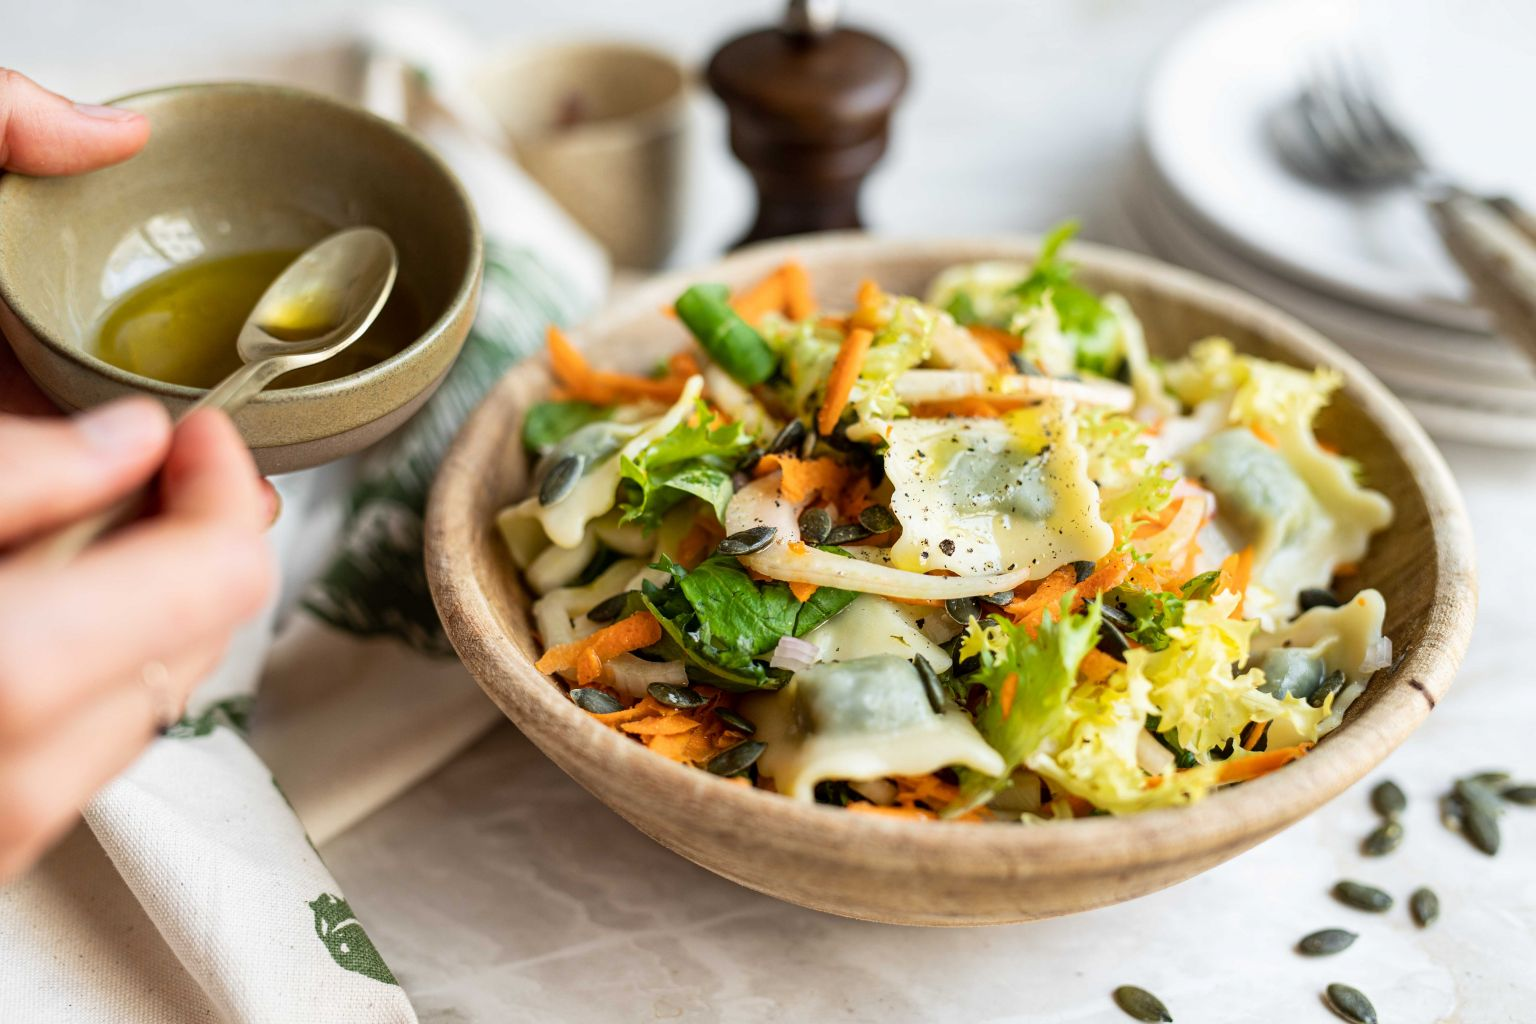 Salade de ravioli au boursin et graines de courge